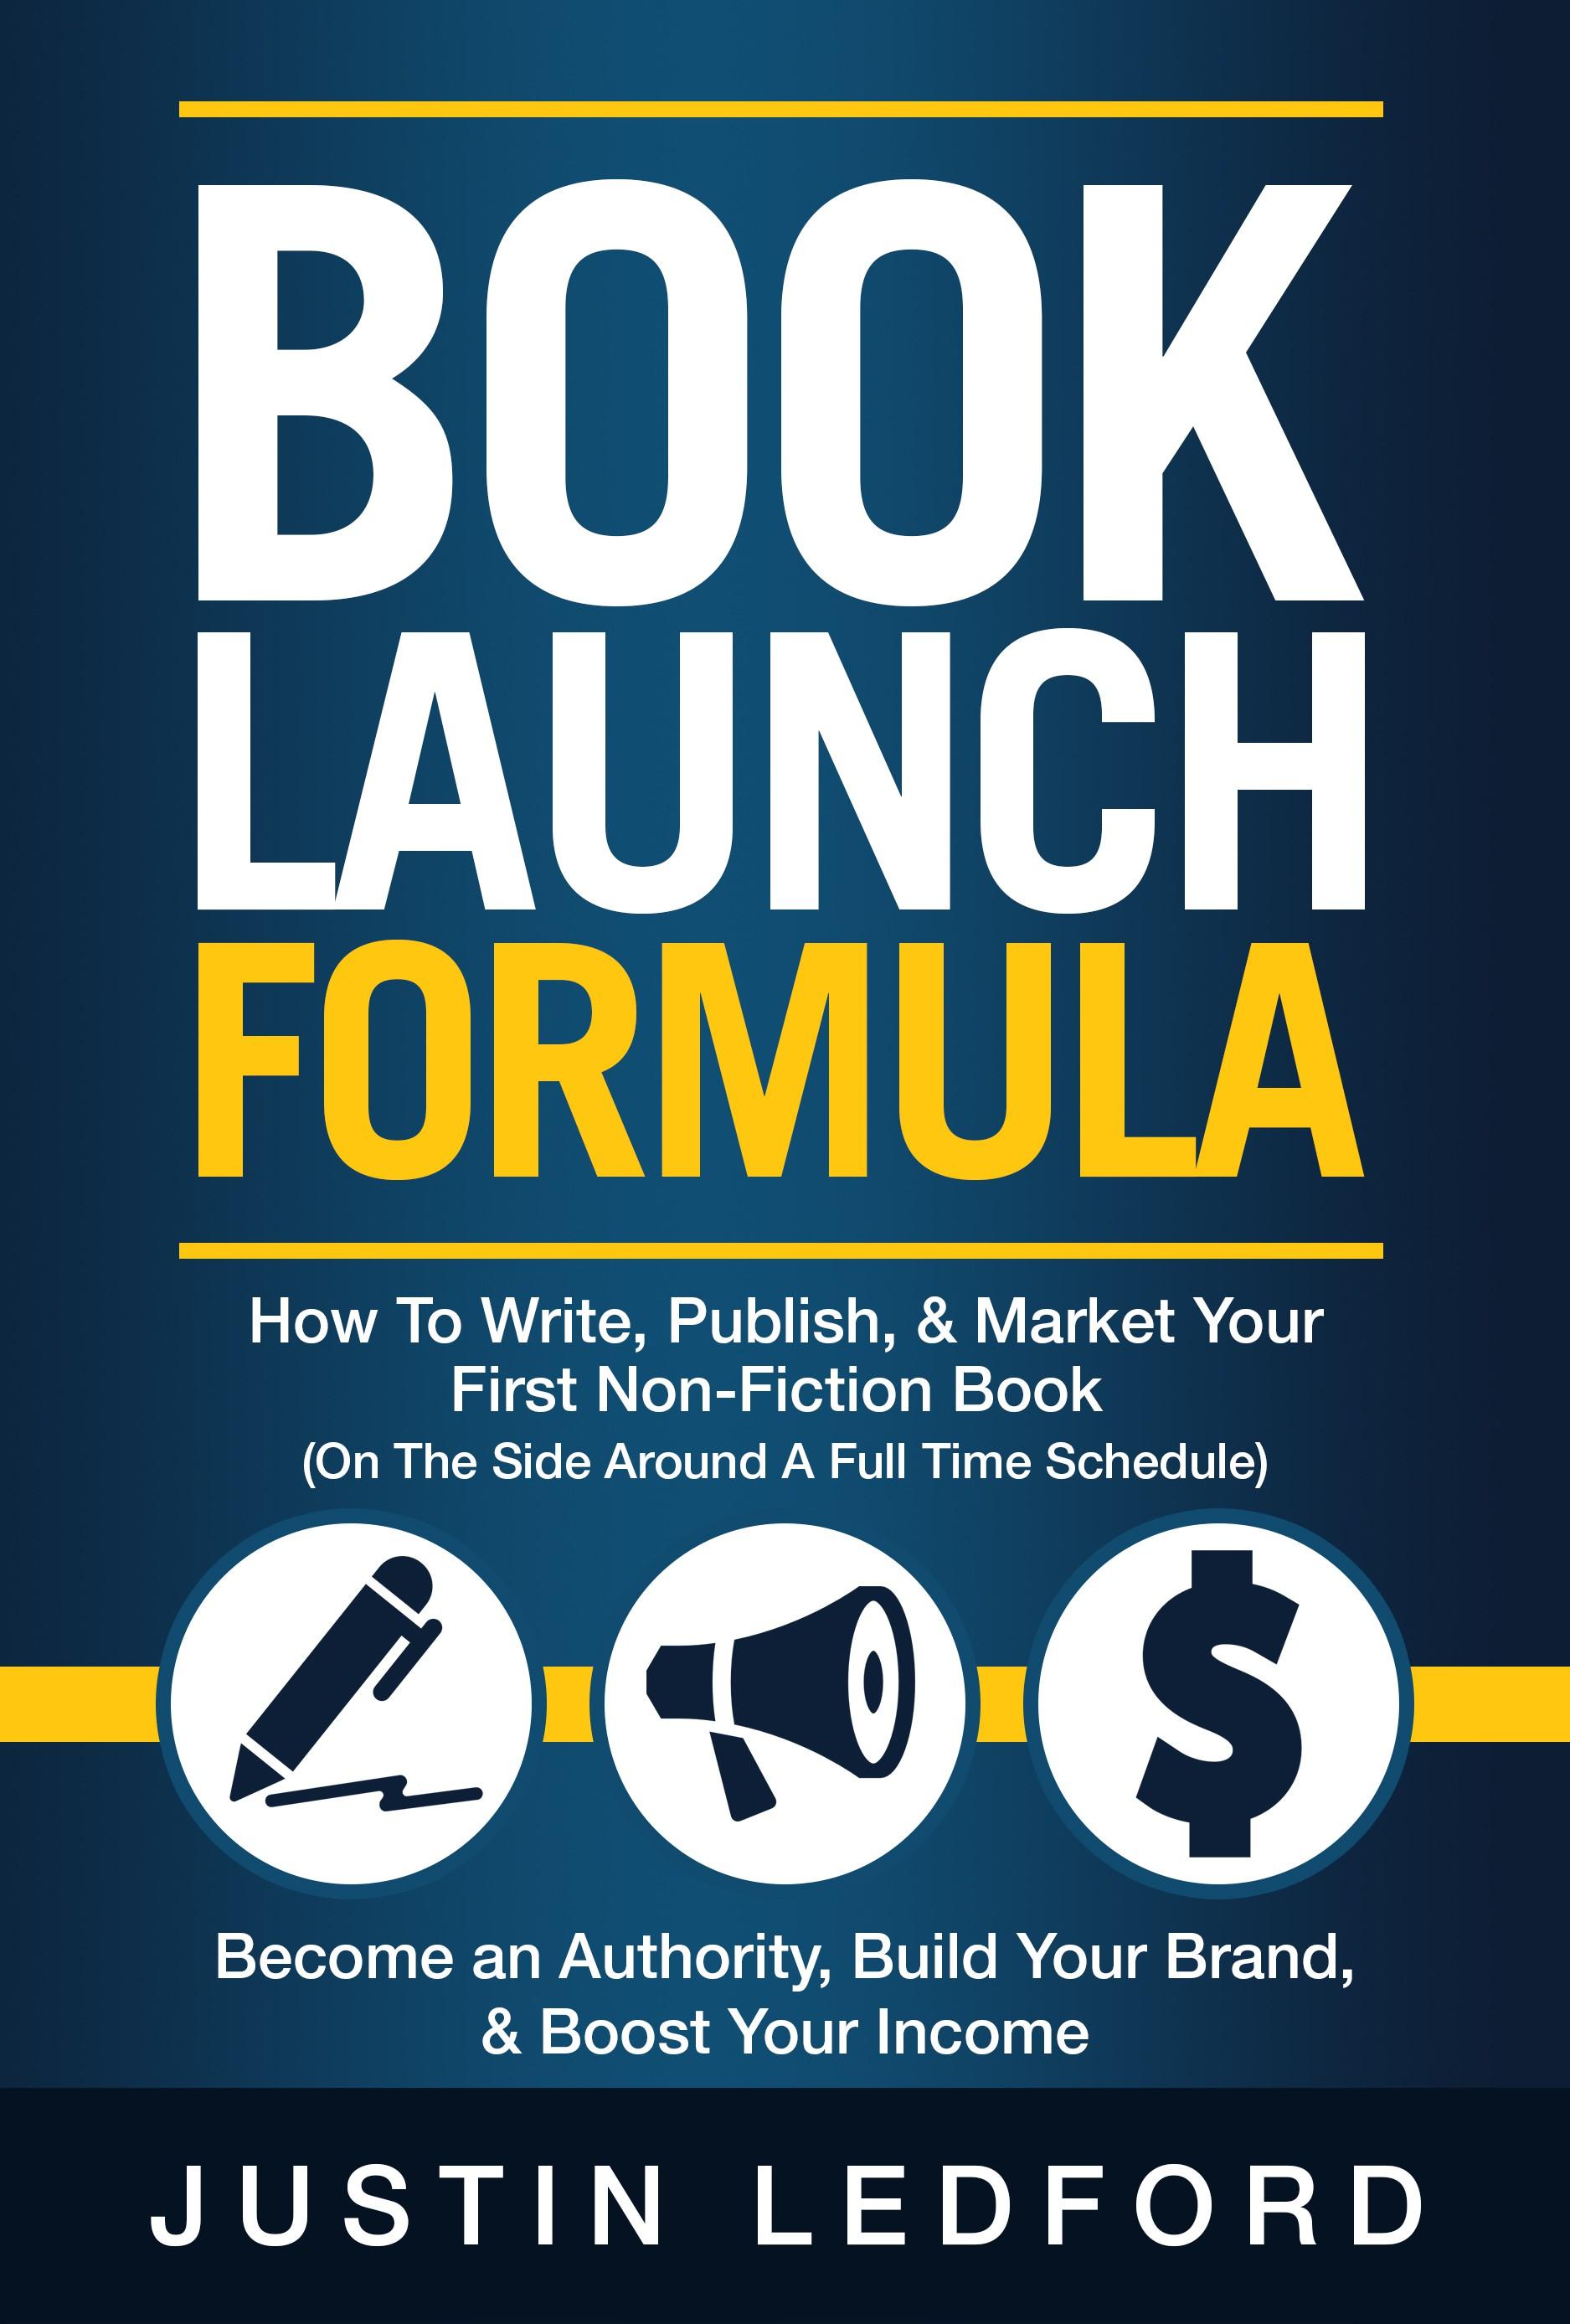 Book Launch Book